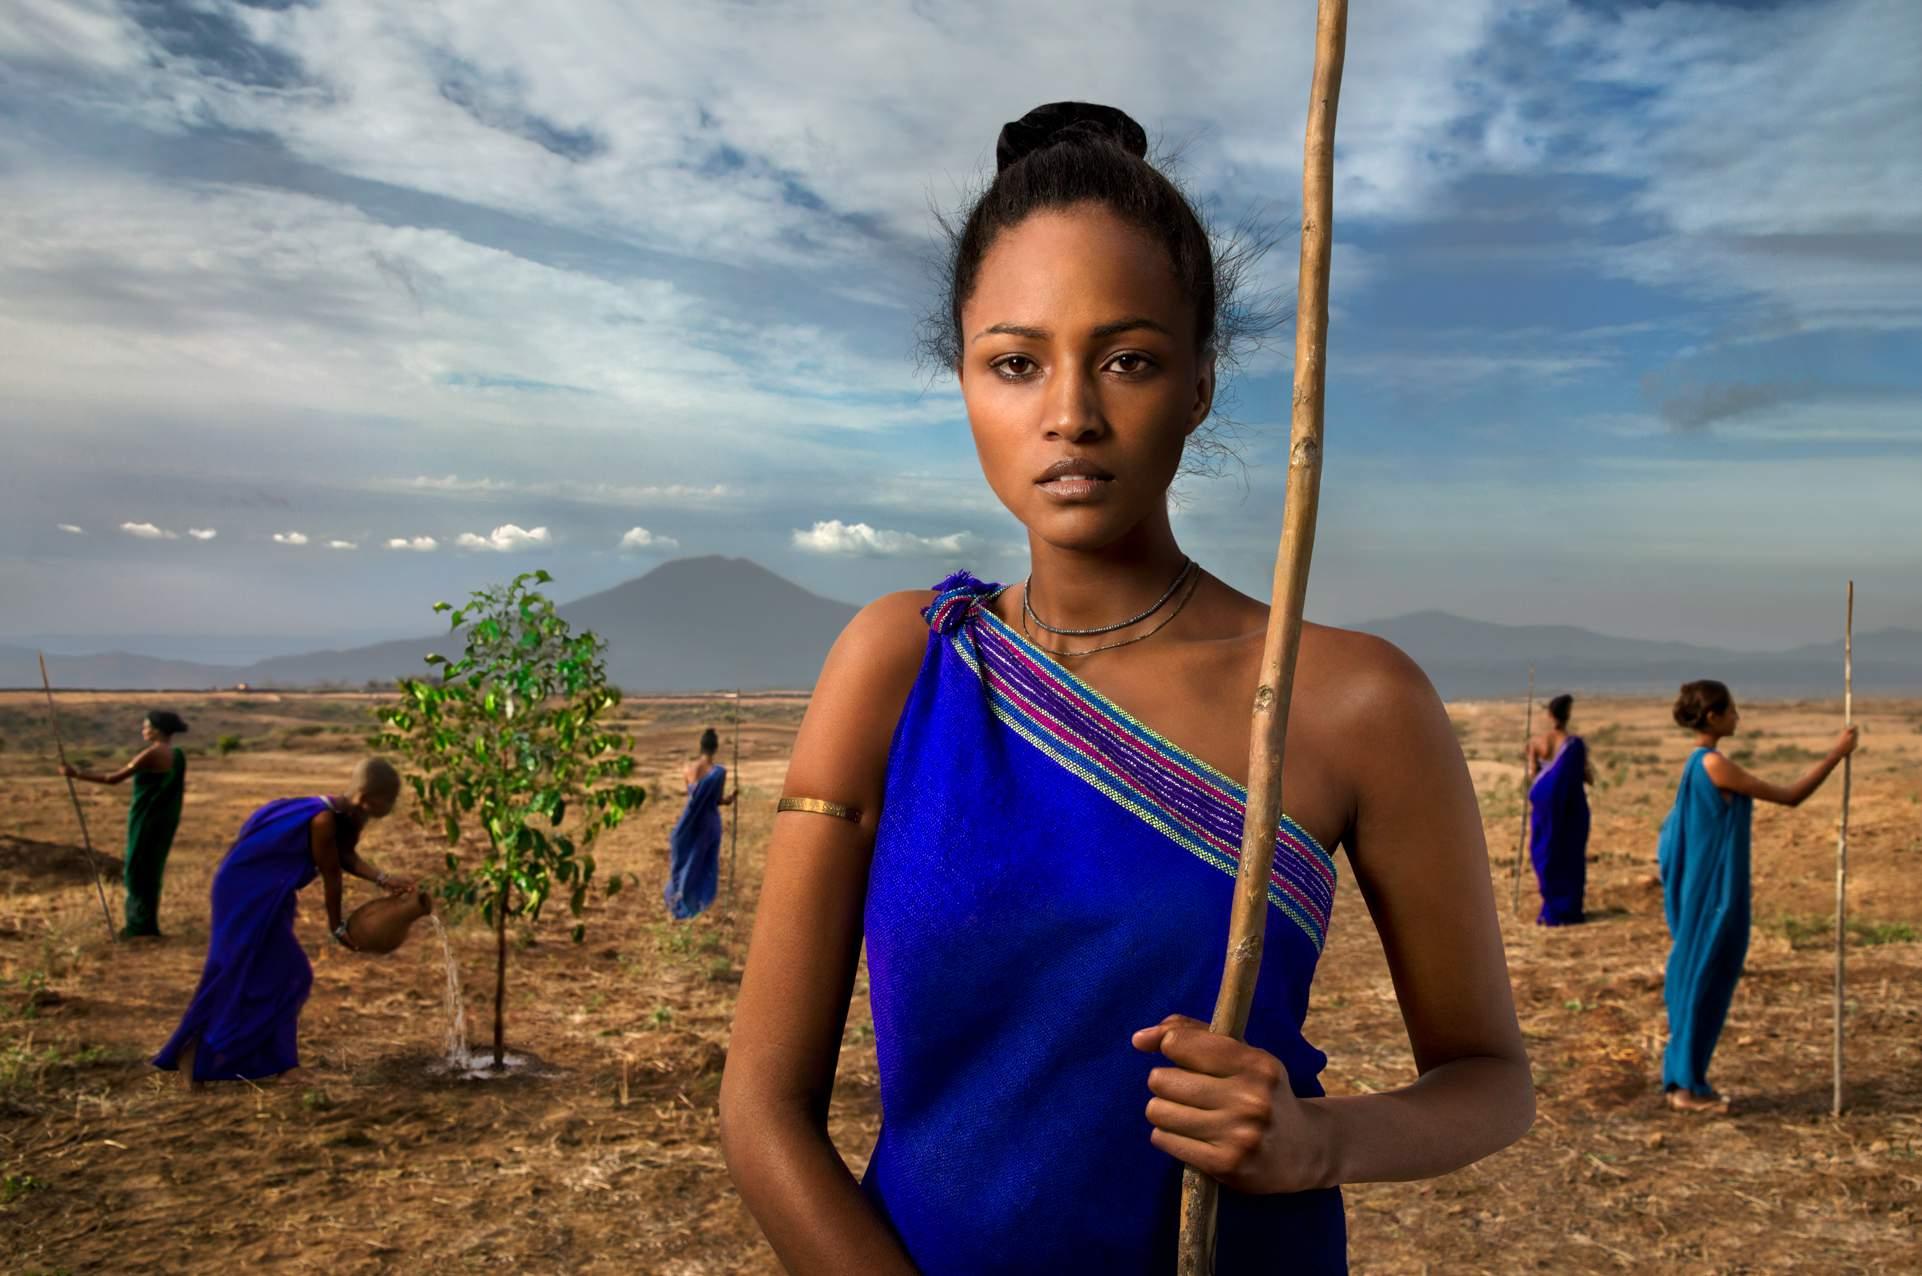 ... Steve McCurry, The Earth Defenders 2015 Lavazza Calendar2LUXURY2.COM